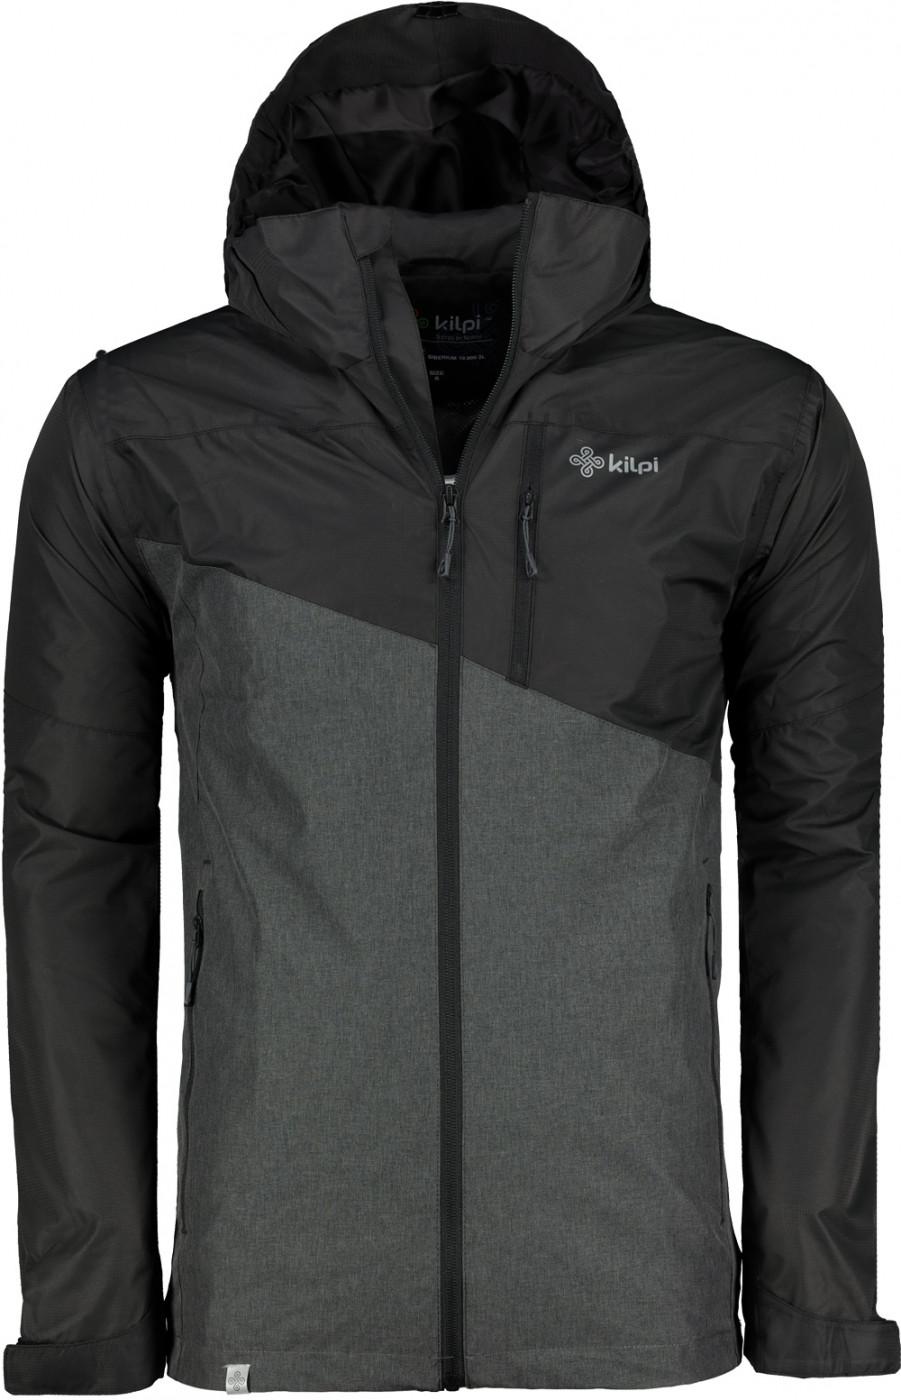 Men's jacket Kilpi ORLETI-M